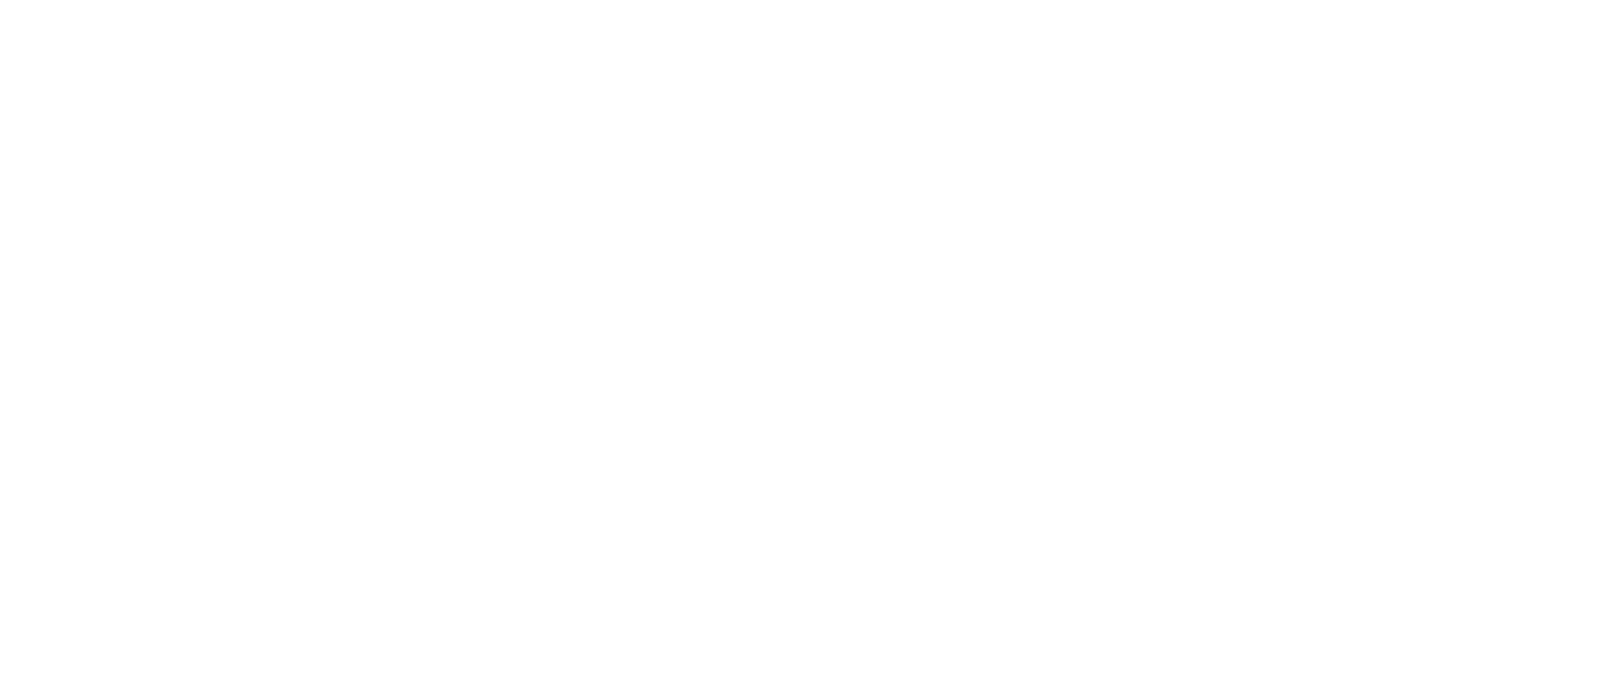 European Digital Commerce 2020